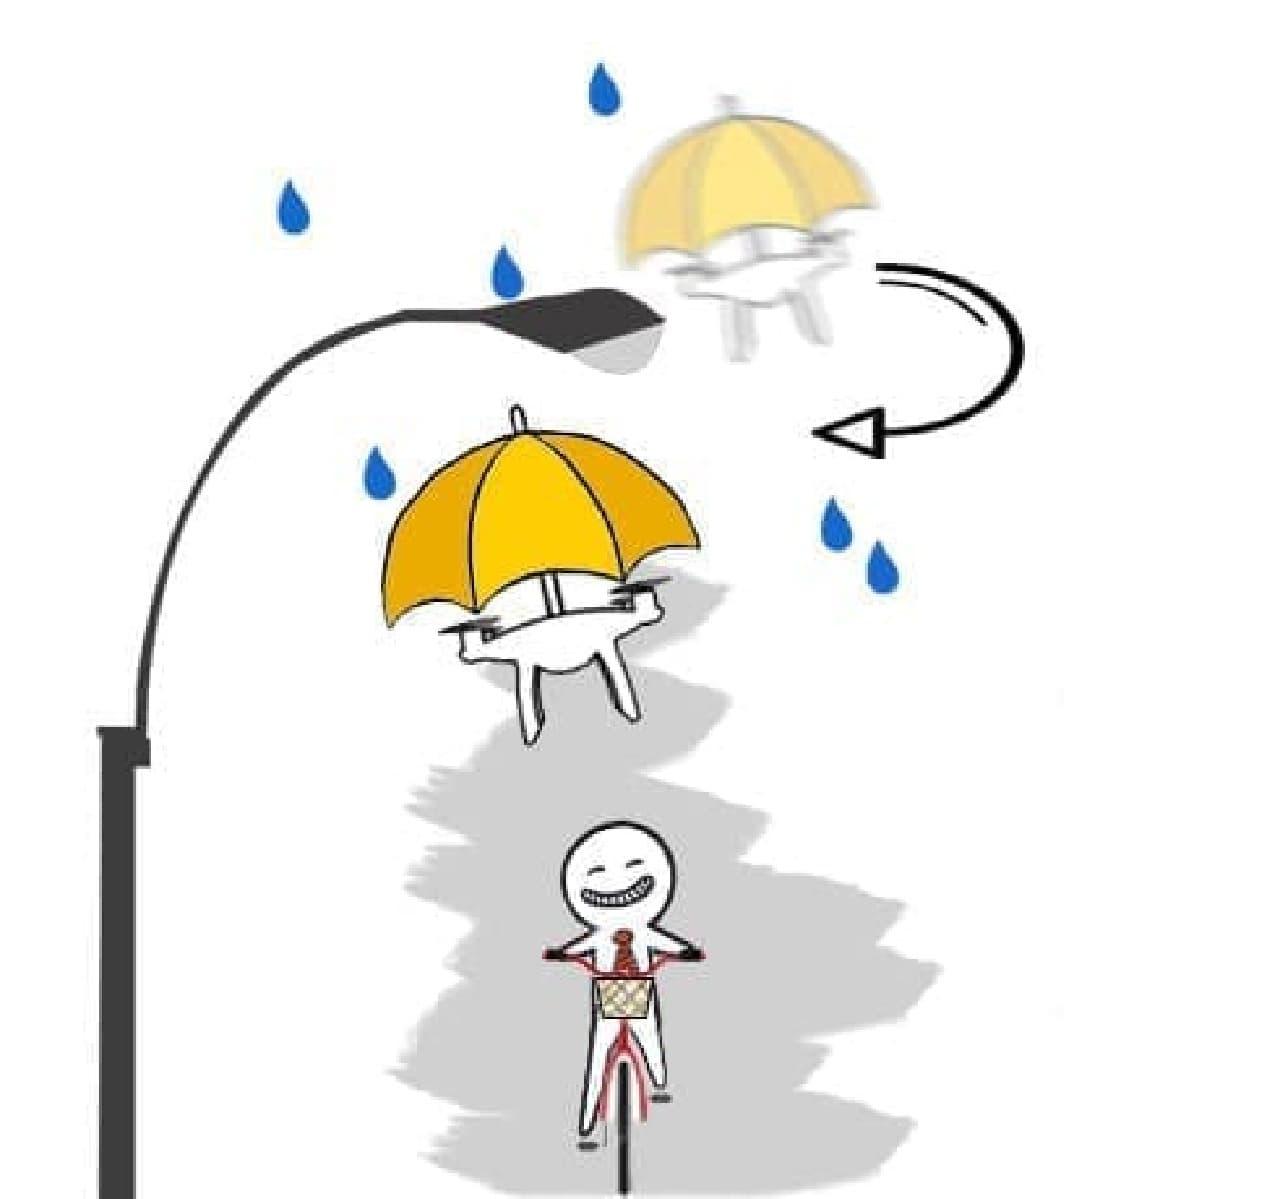 Hands Free Umbrella Drone